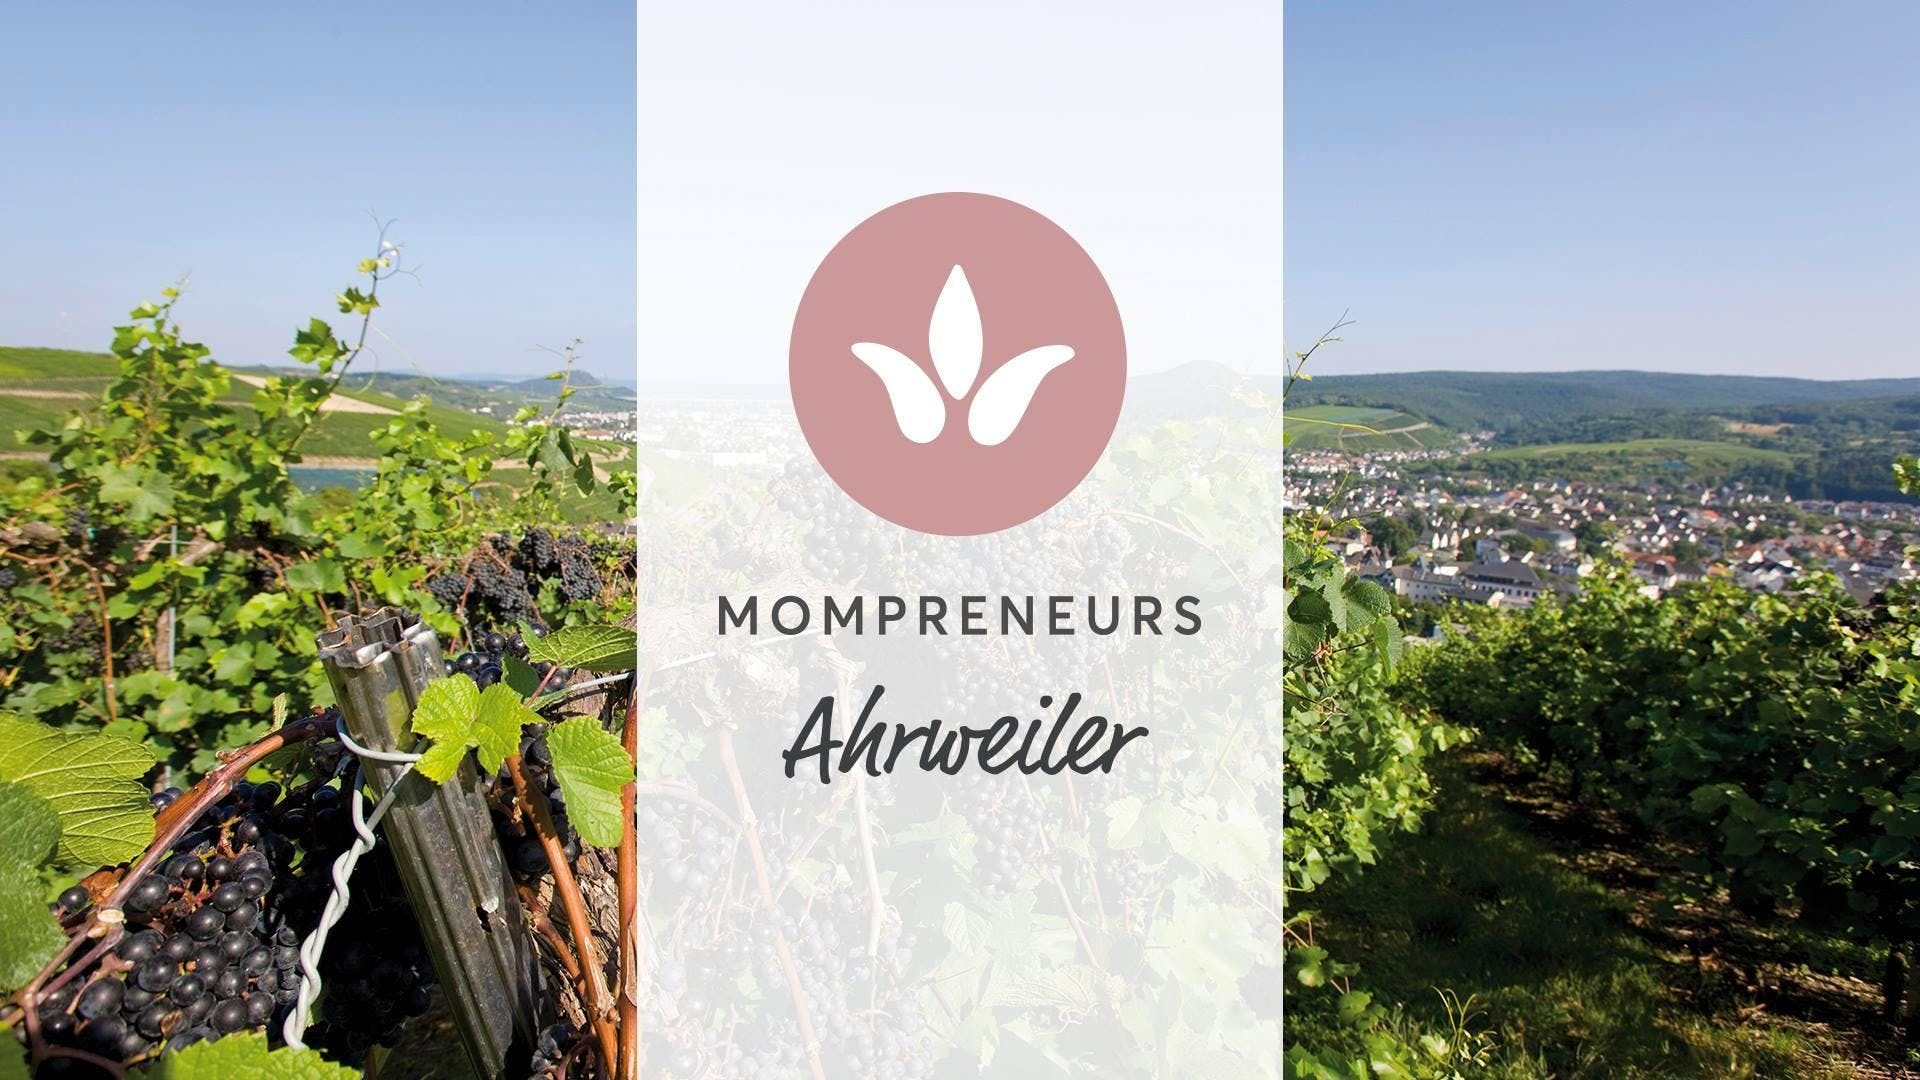 MomPreneurs Ahrweiler Meetup: Social Media ef